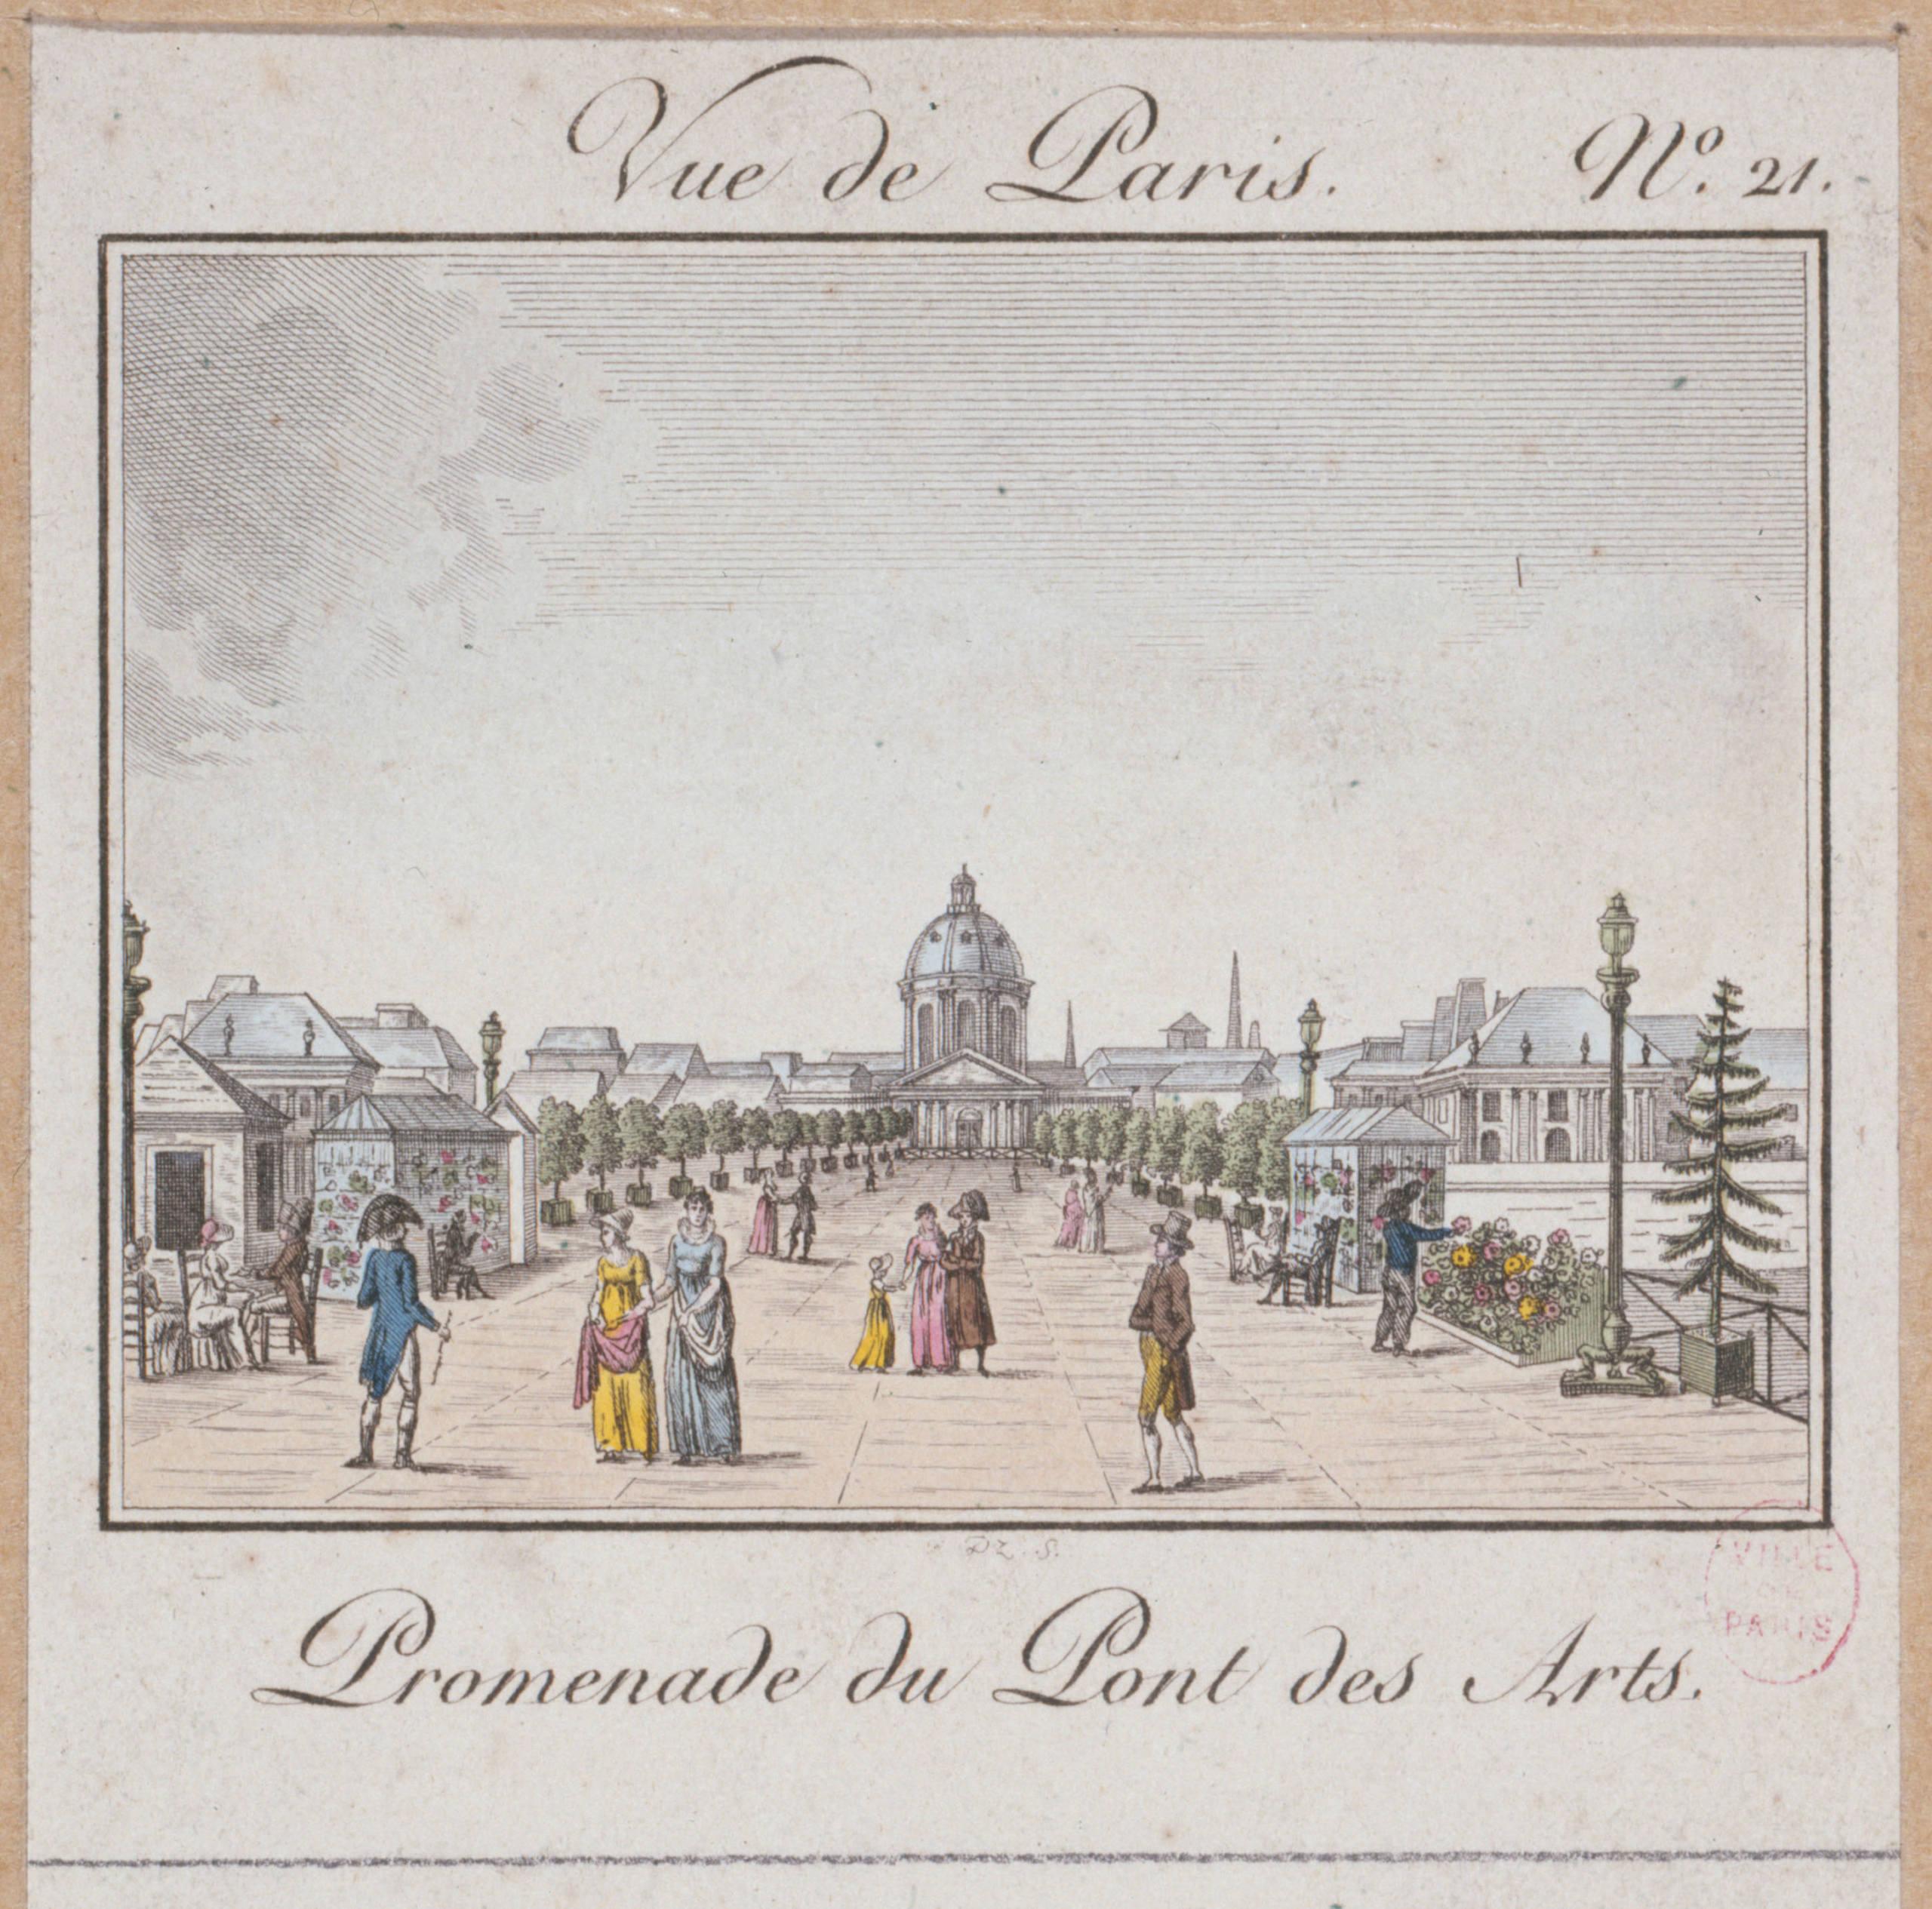 Paris au XVIIIe siècle - Page 6 Image_49